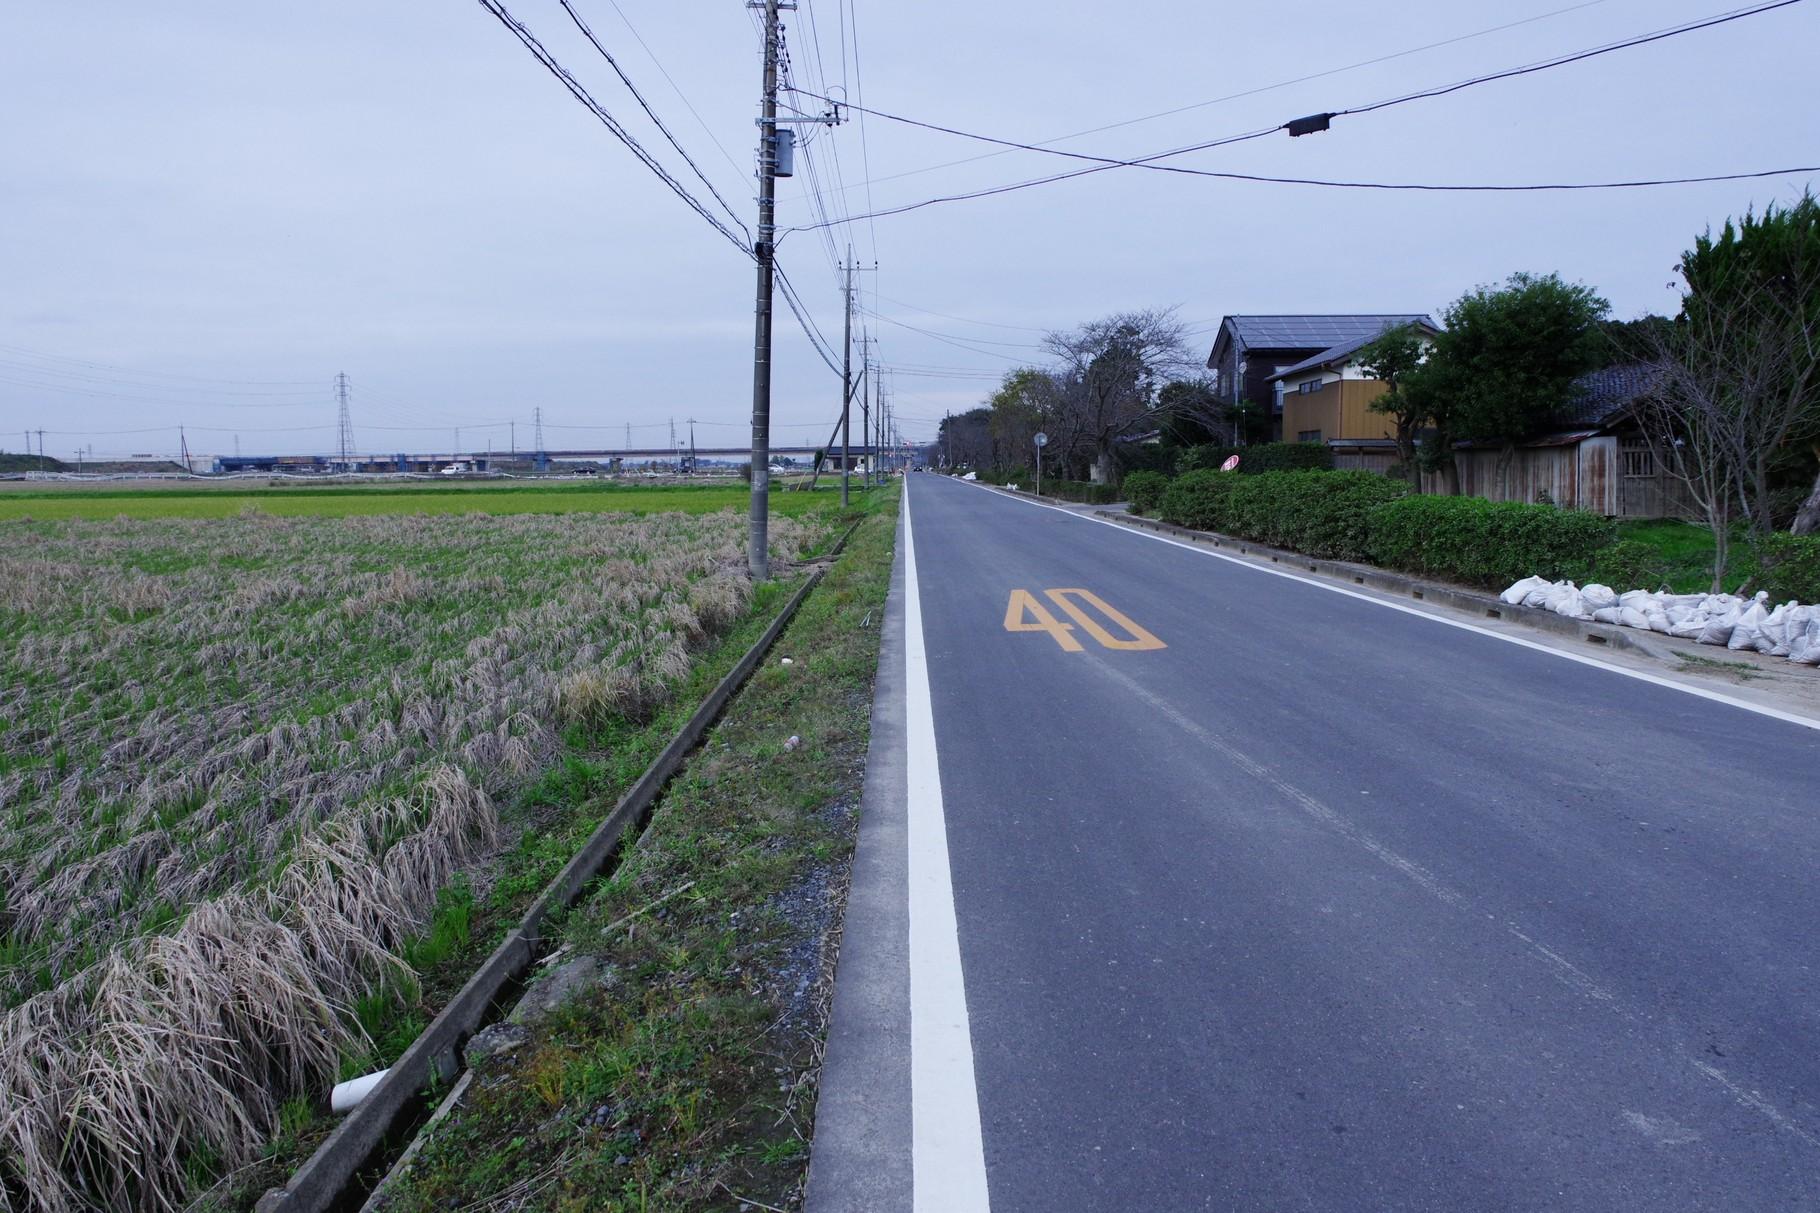 沖新田 北北西方向が若宮戸と三坂町